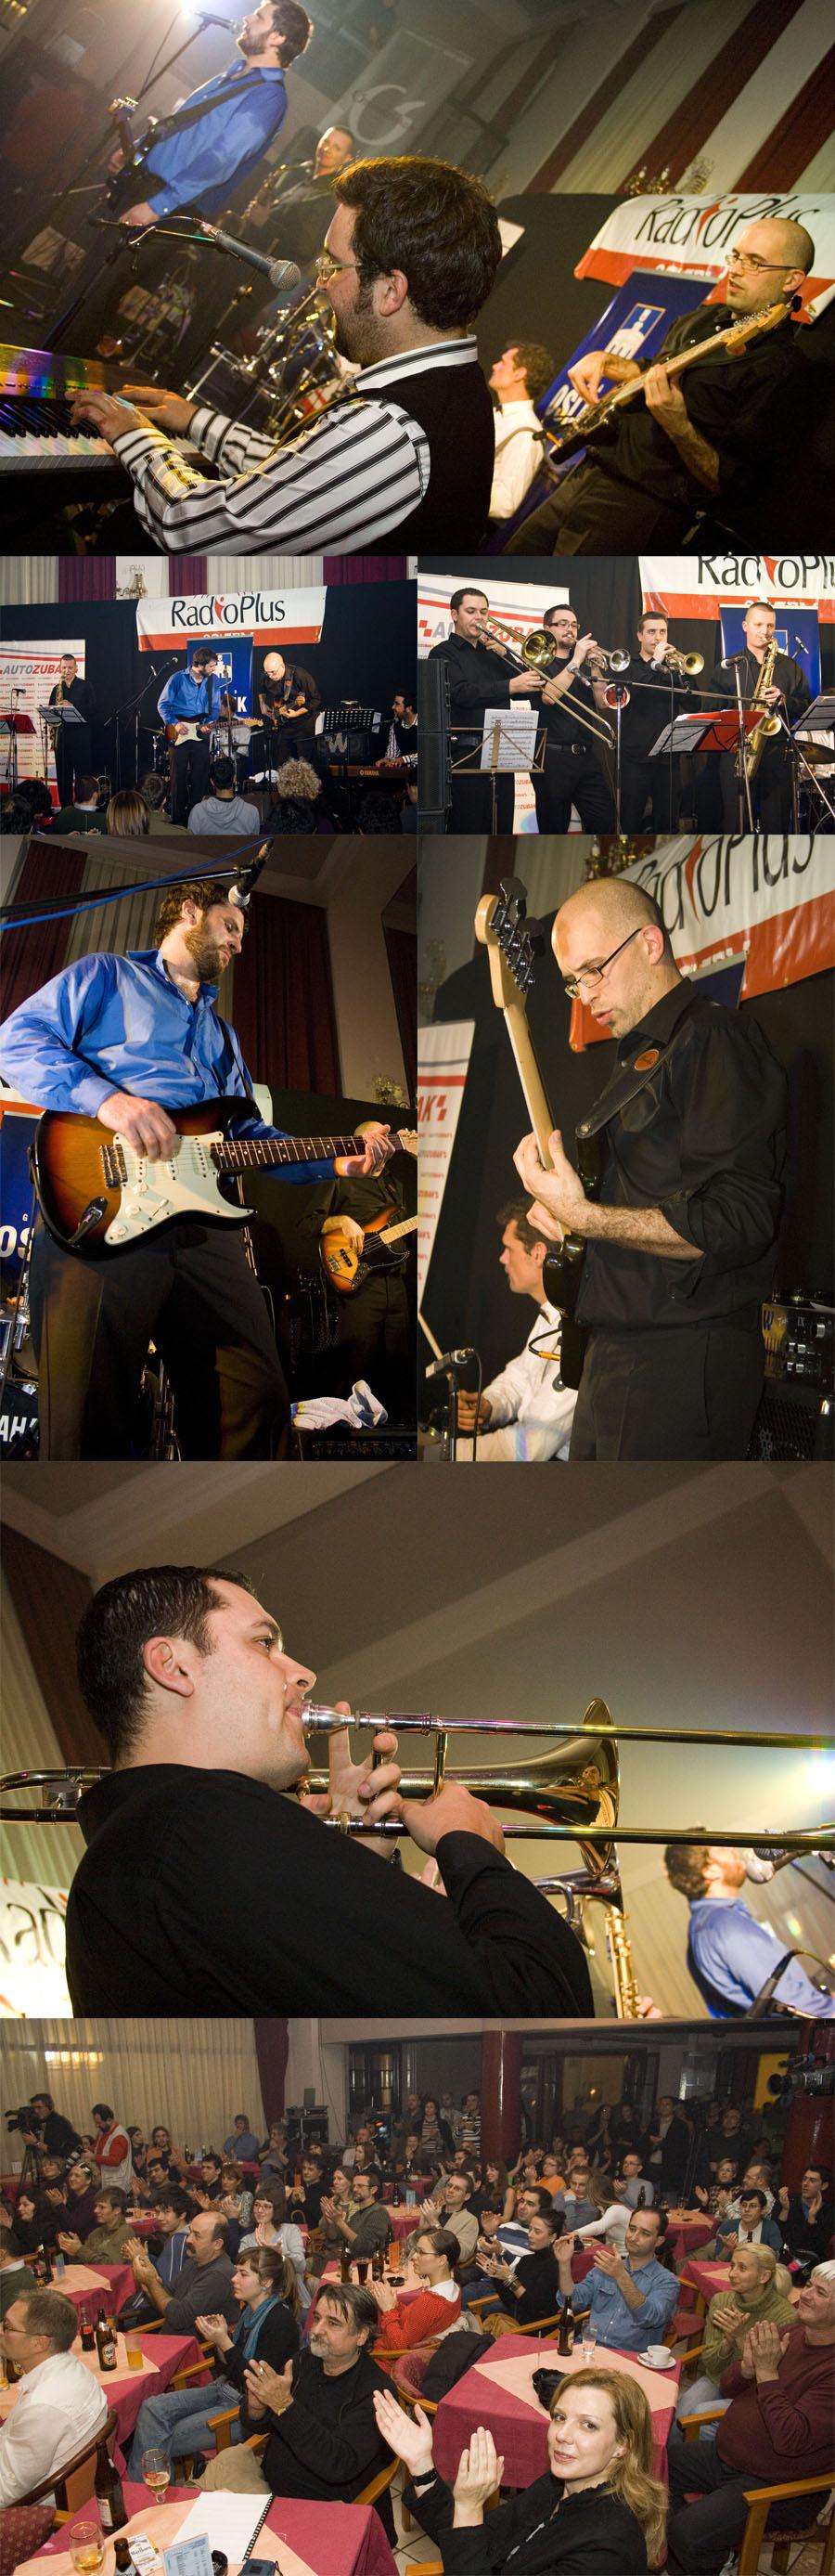 Greenhouse Blues Band   [url=http://www.osijek031.com/osijek.php?najava_id=15550]4. Međunarodni gala blues festival - Osijek 2008[/url]  Foto: Daniel Antunović  Ključne riječi: gala blues festival central